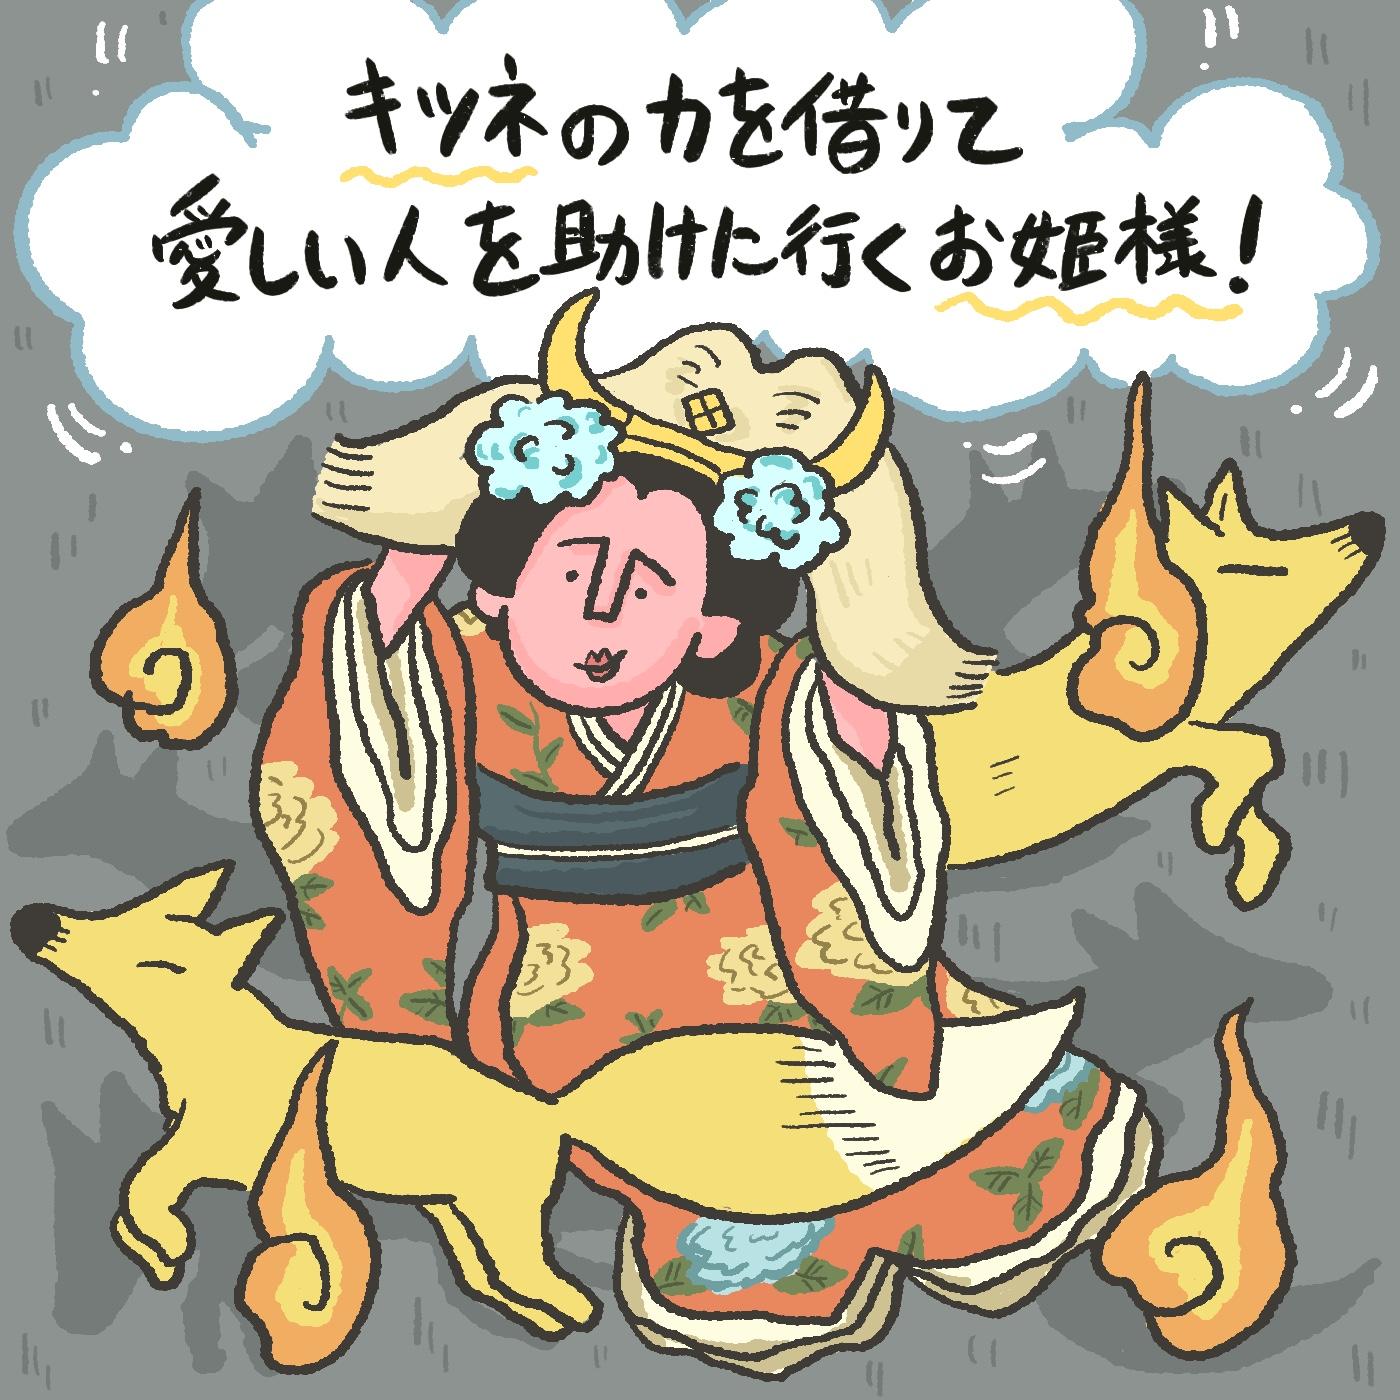 OBIKAKE ナニソレ 八重垣姫 藤野遼太